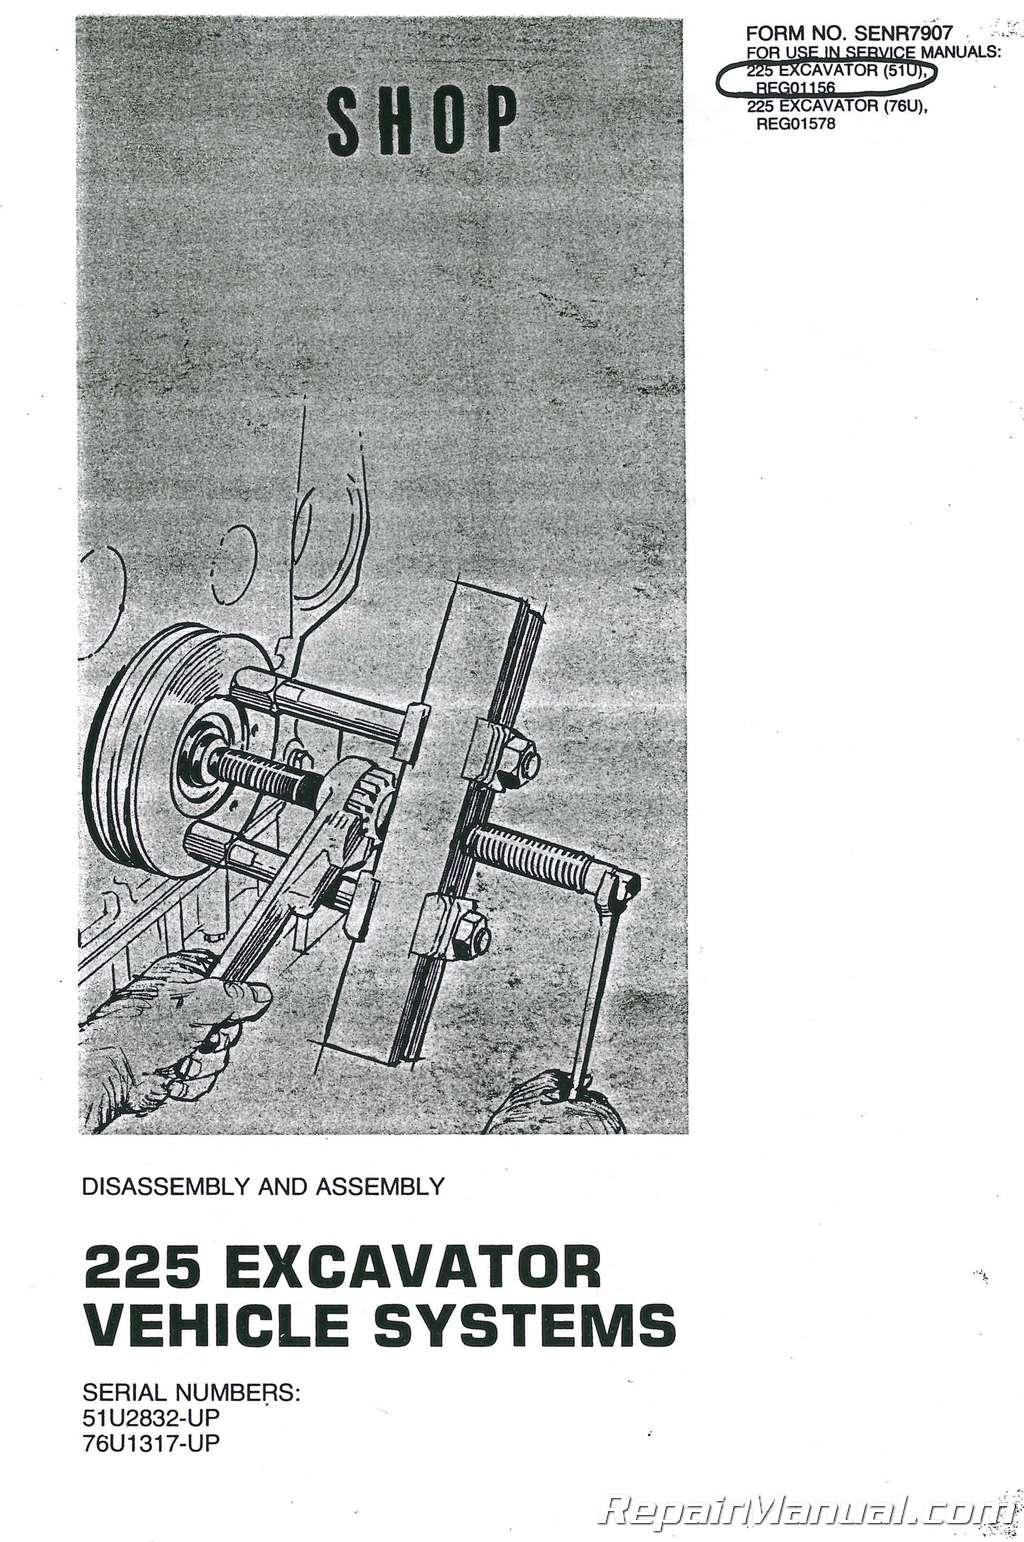 Caterpillar 225 Excavator Service Manual